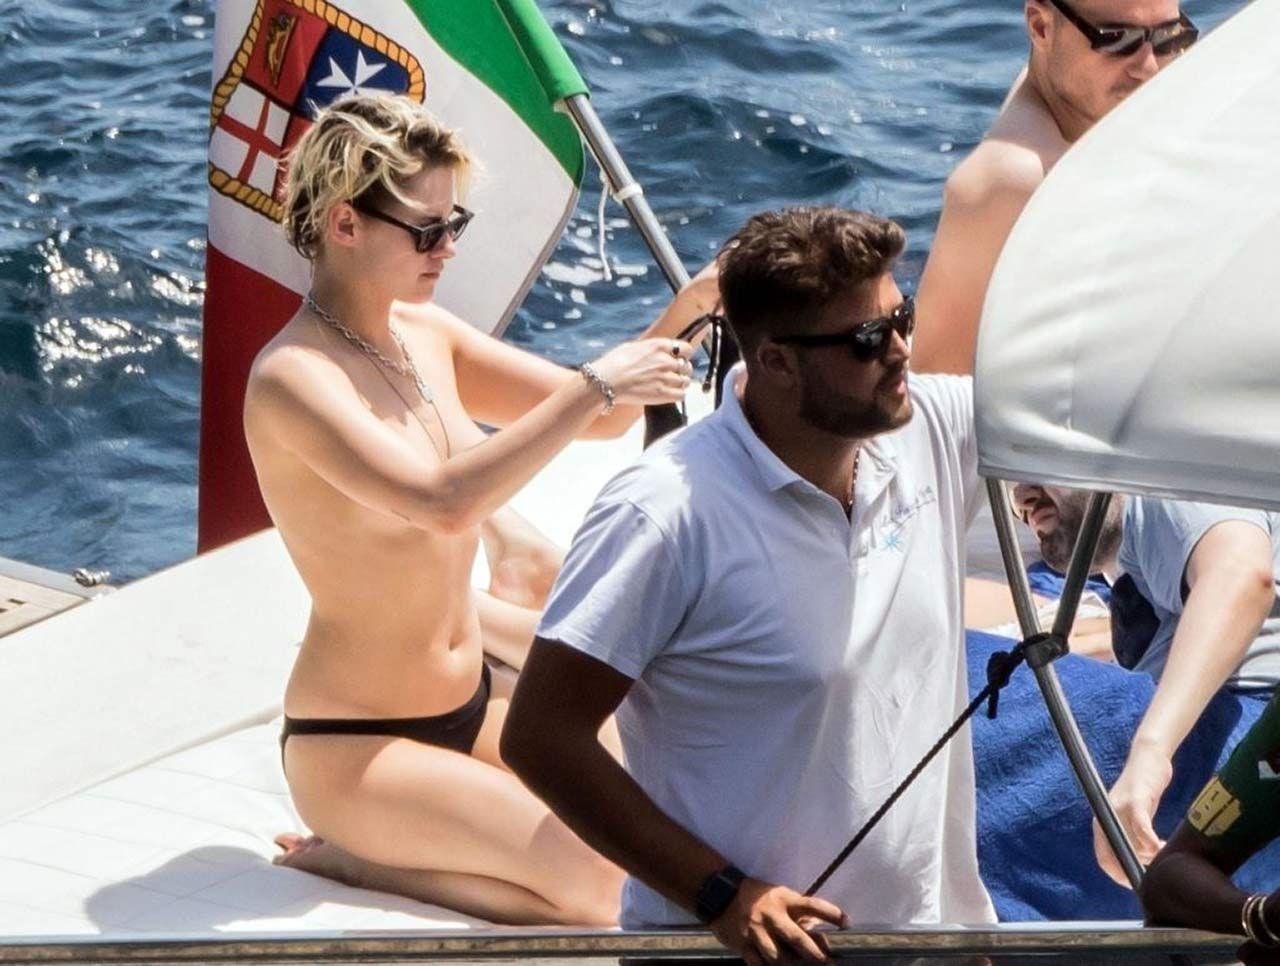 Kristen Stewart Nude Sexy Thefappeningblog Com 11 1024x773 T